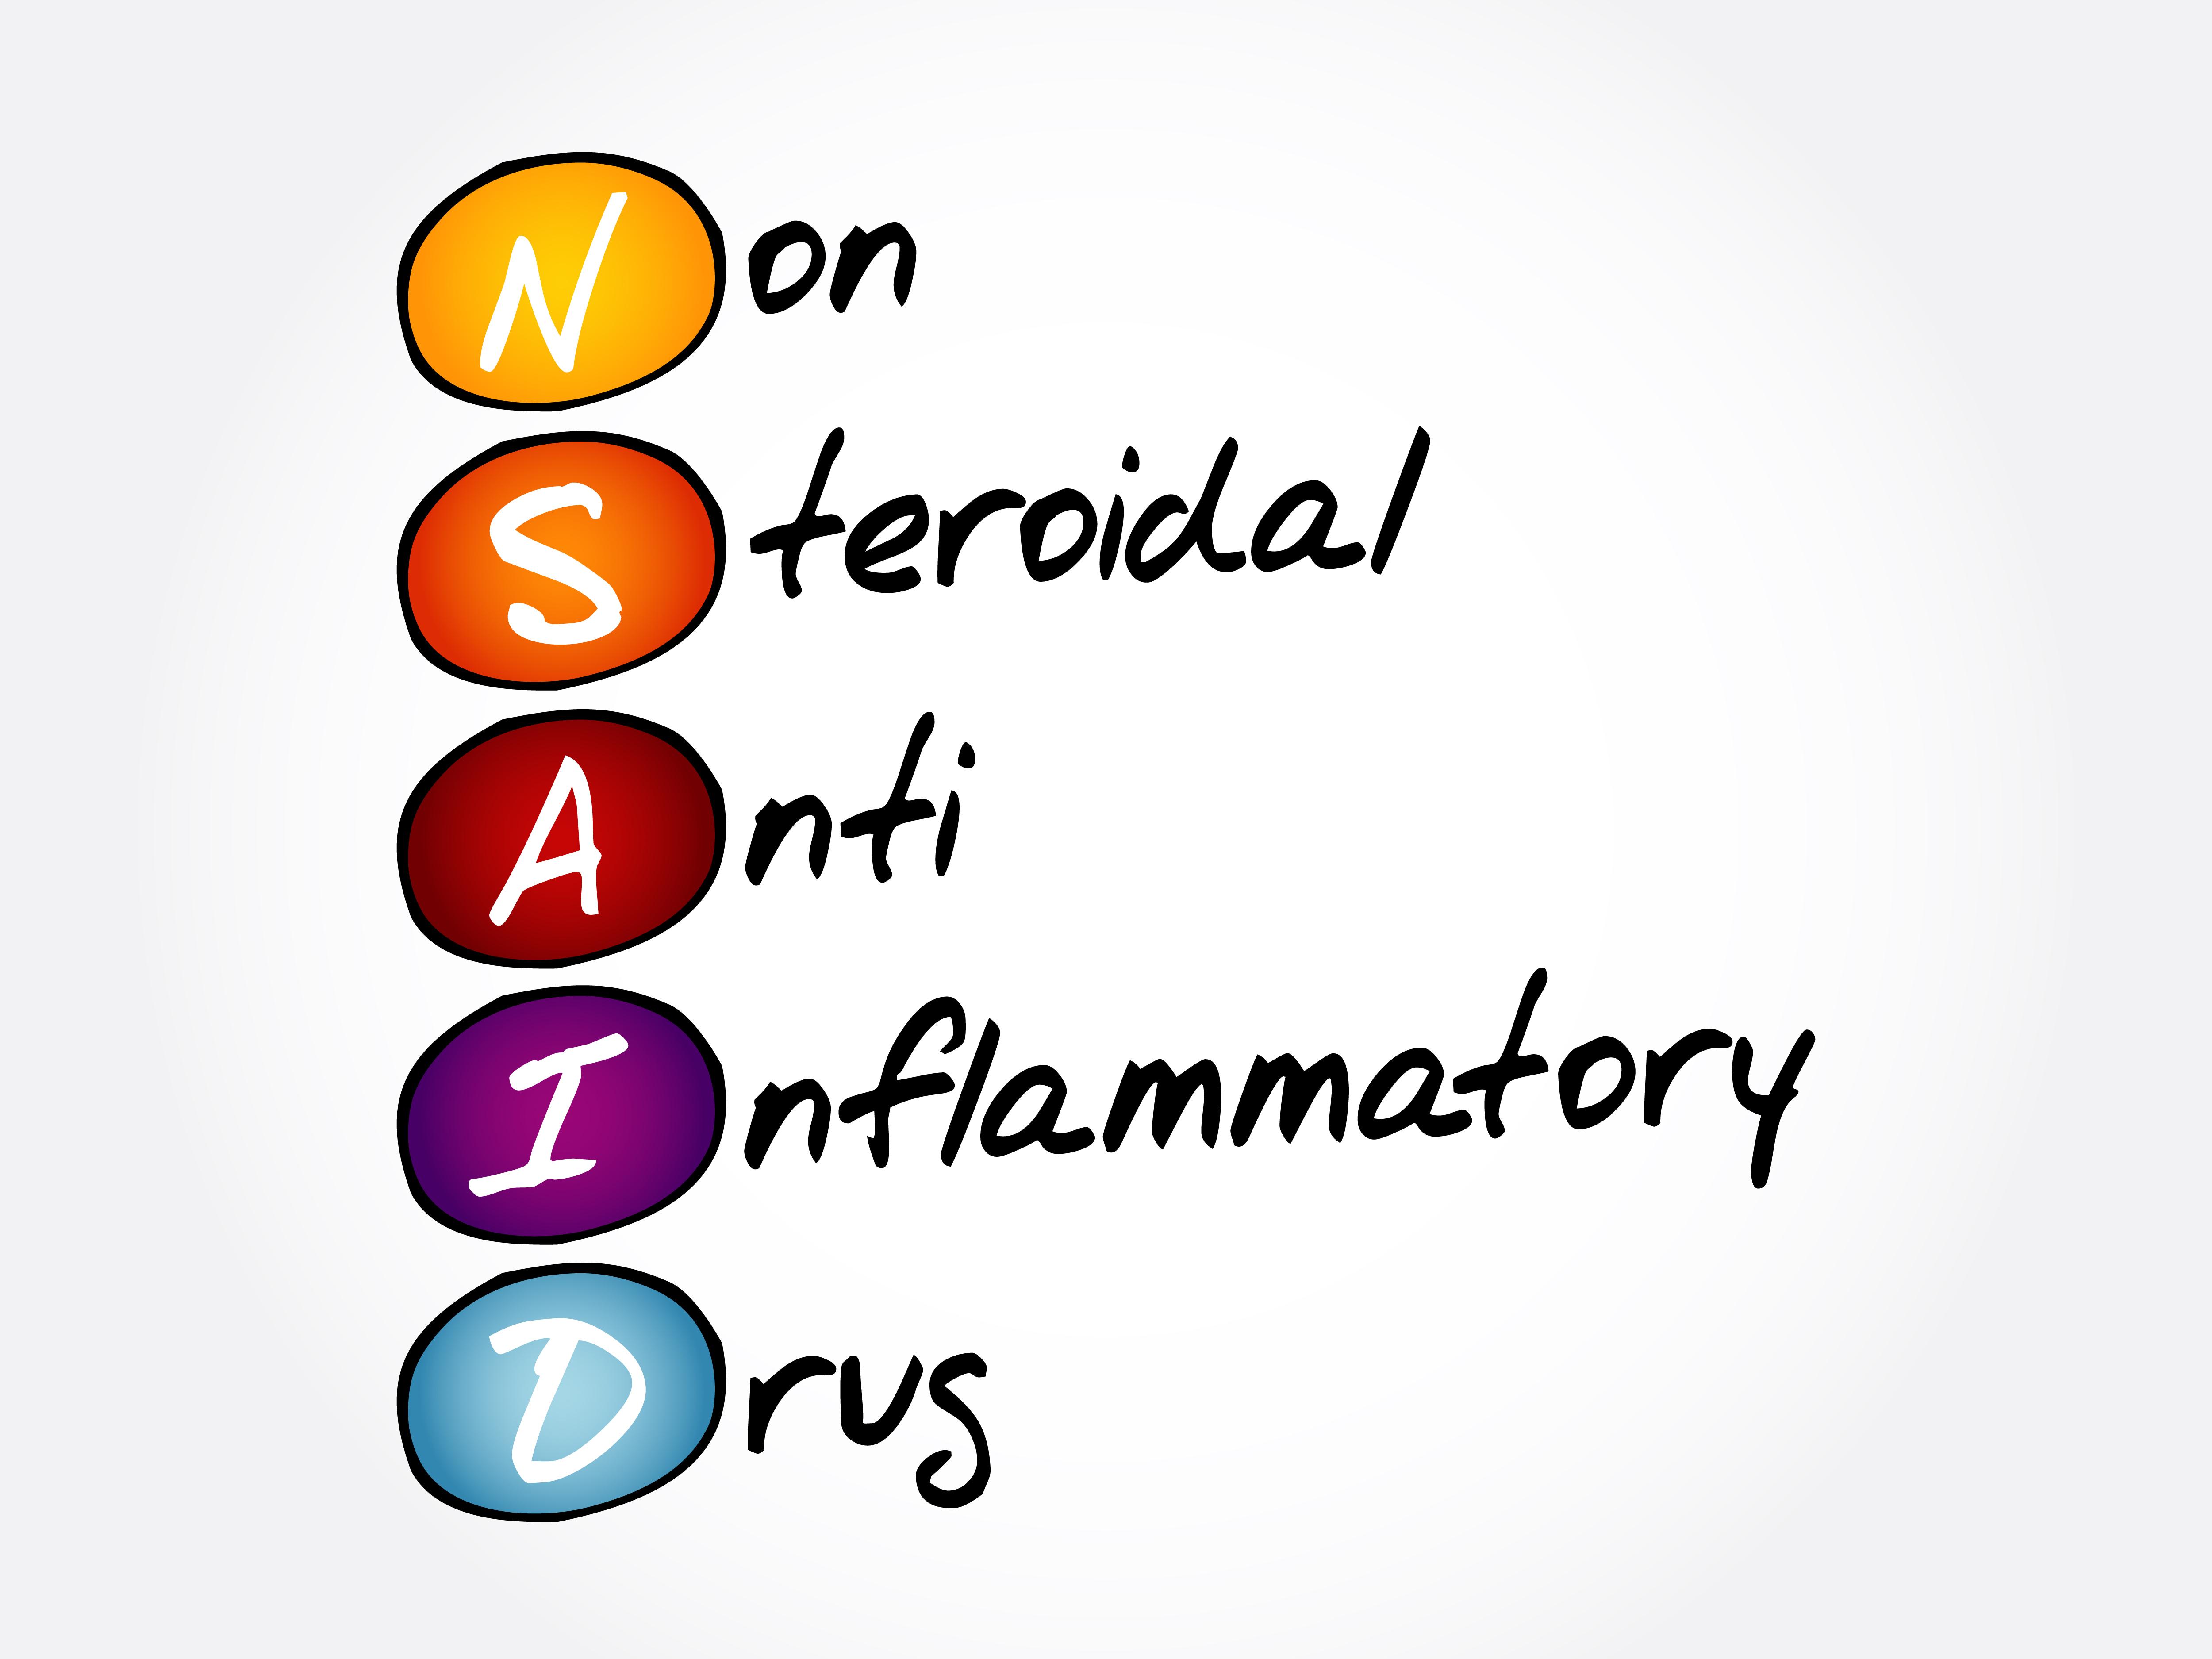 NSAID definitions